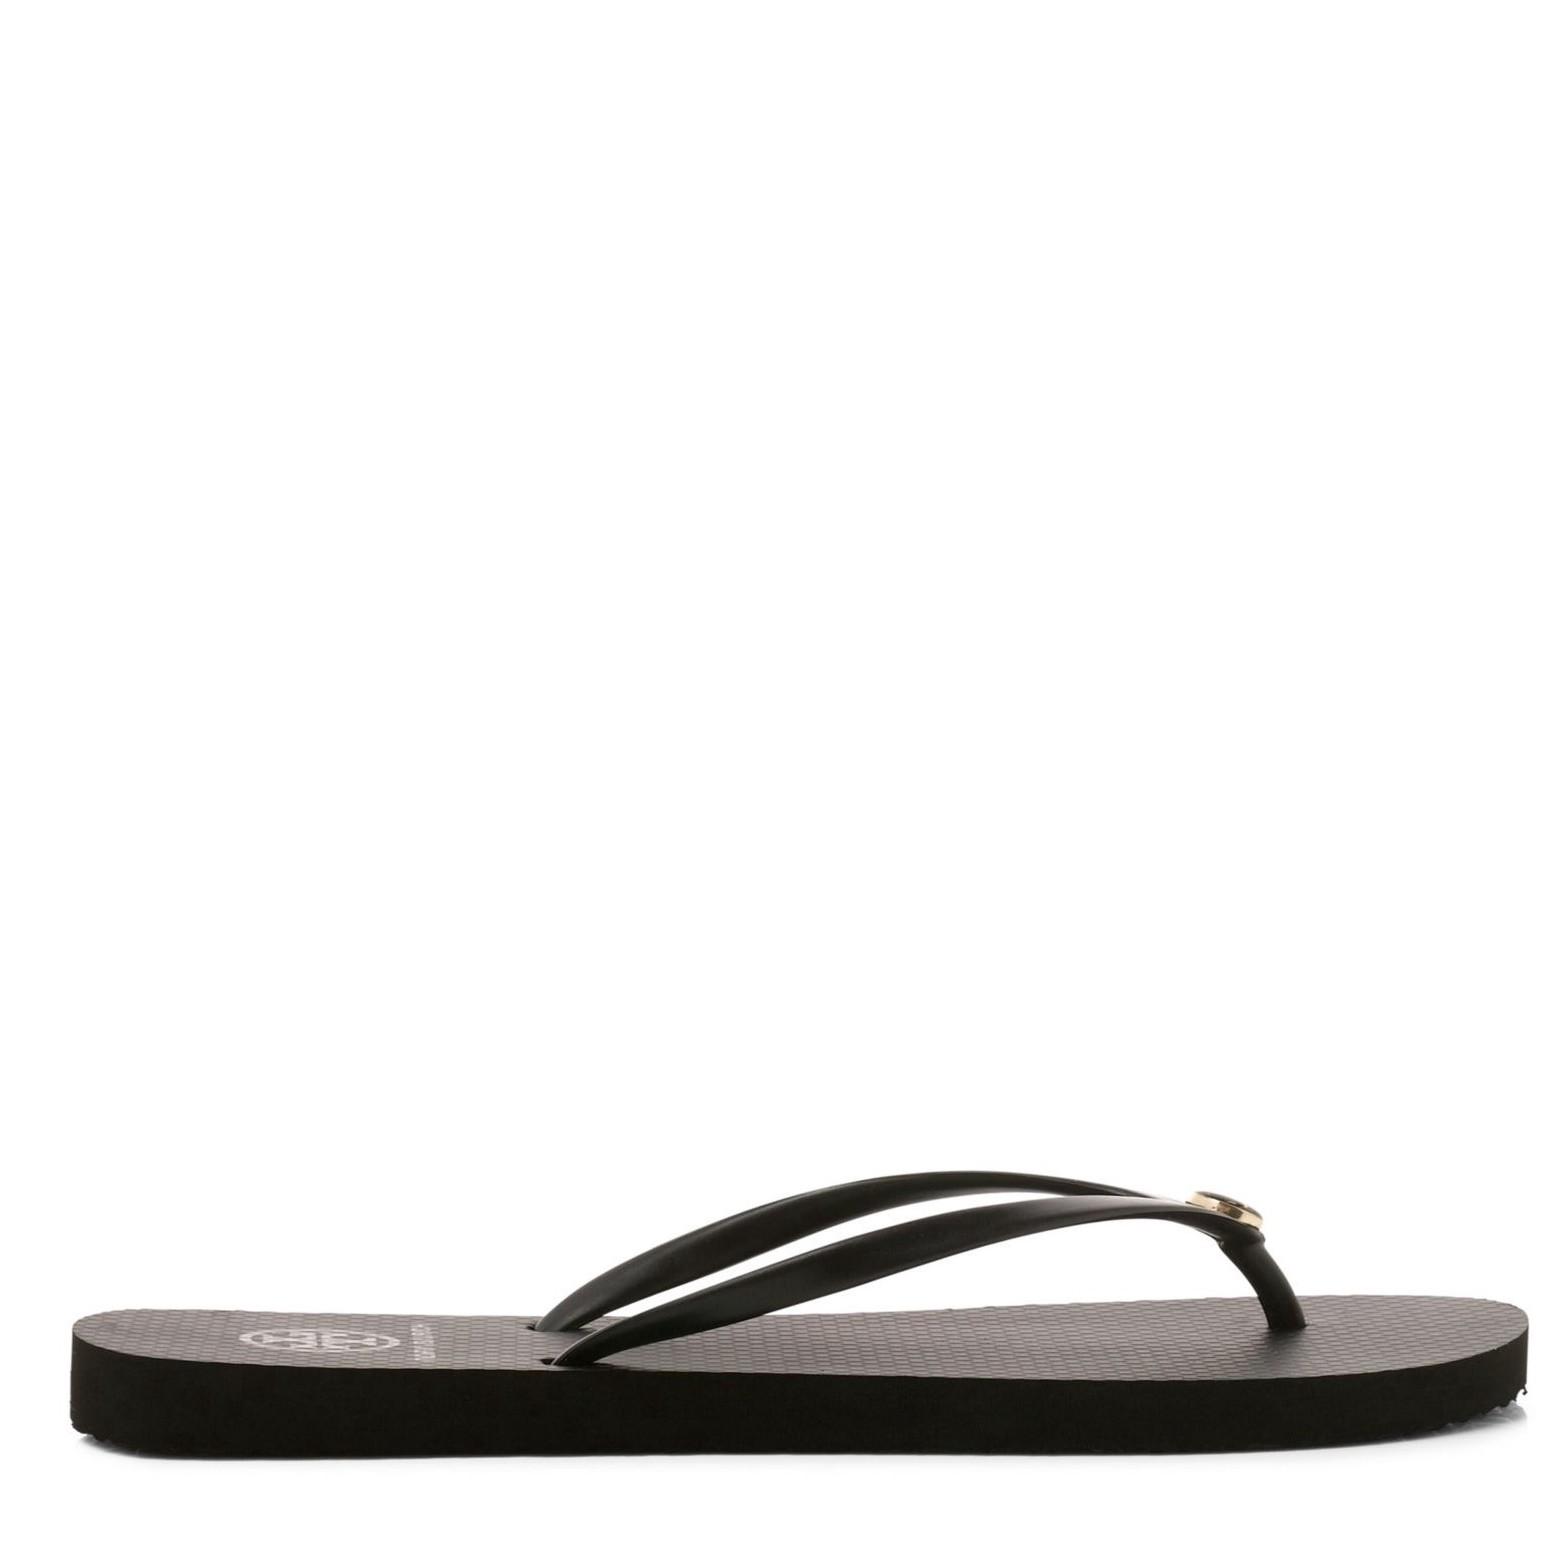 TORY BURCH Thin Flip Flop (Women) in Avalon/ Avalon/ Black